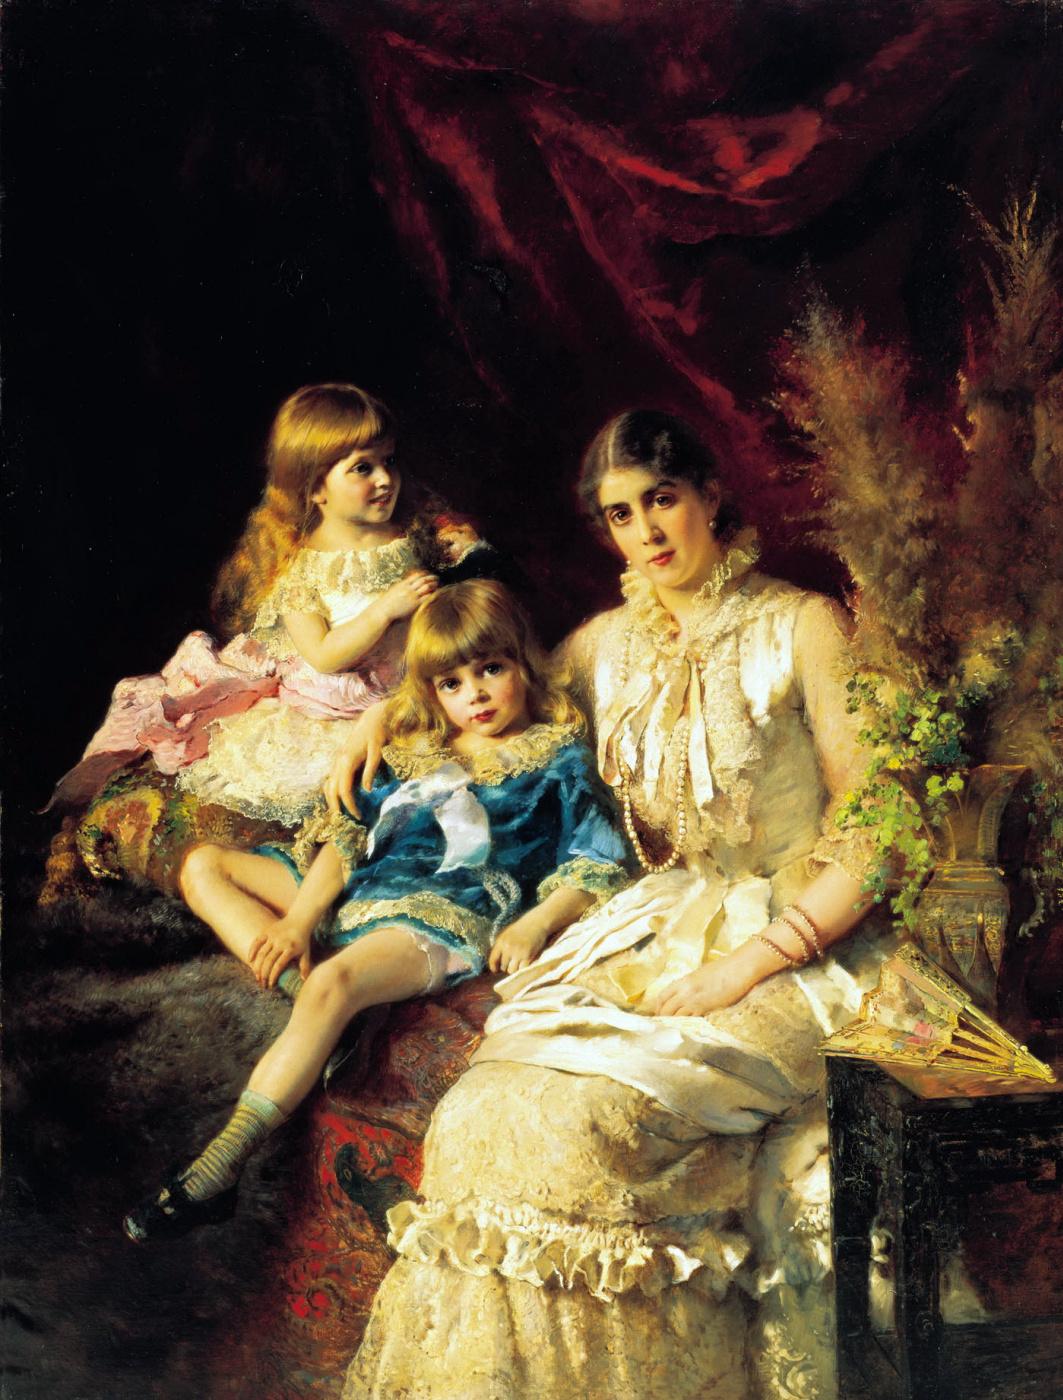 Konstantin Makovsky. Family portrait. J. P. Makowski is depicted with children, Sergei and Elena